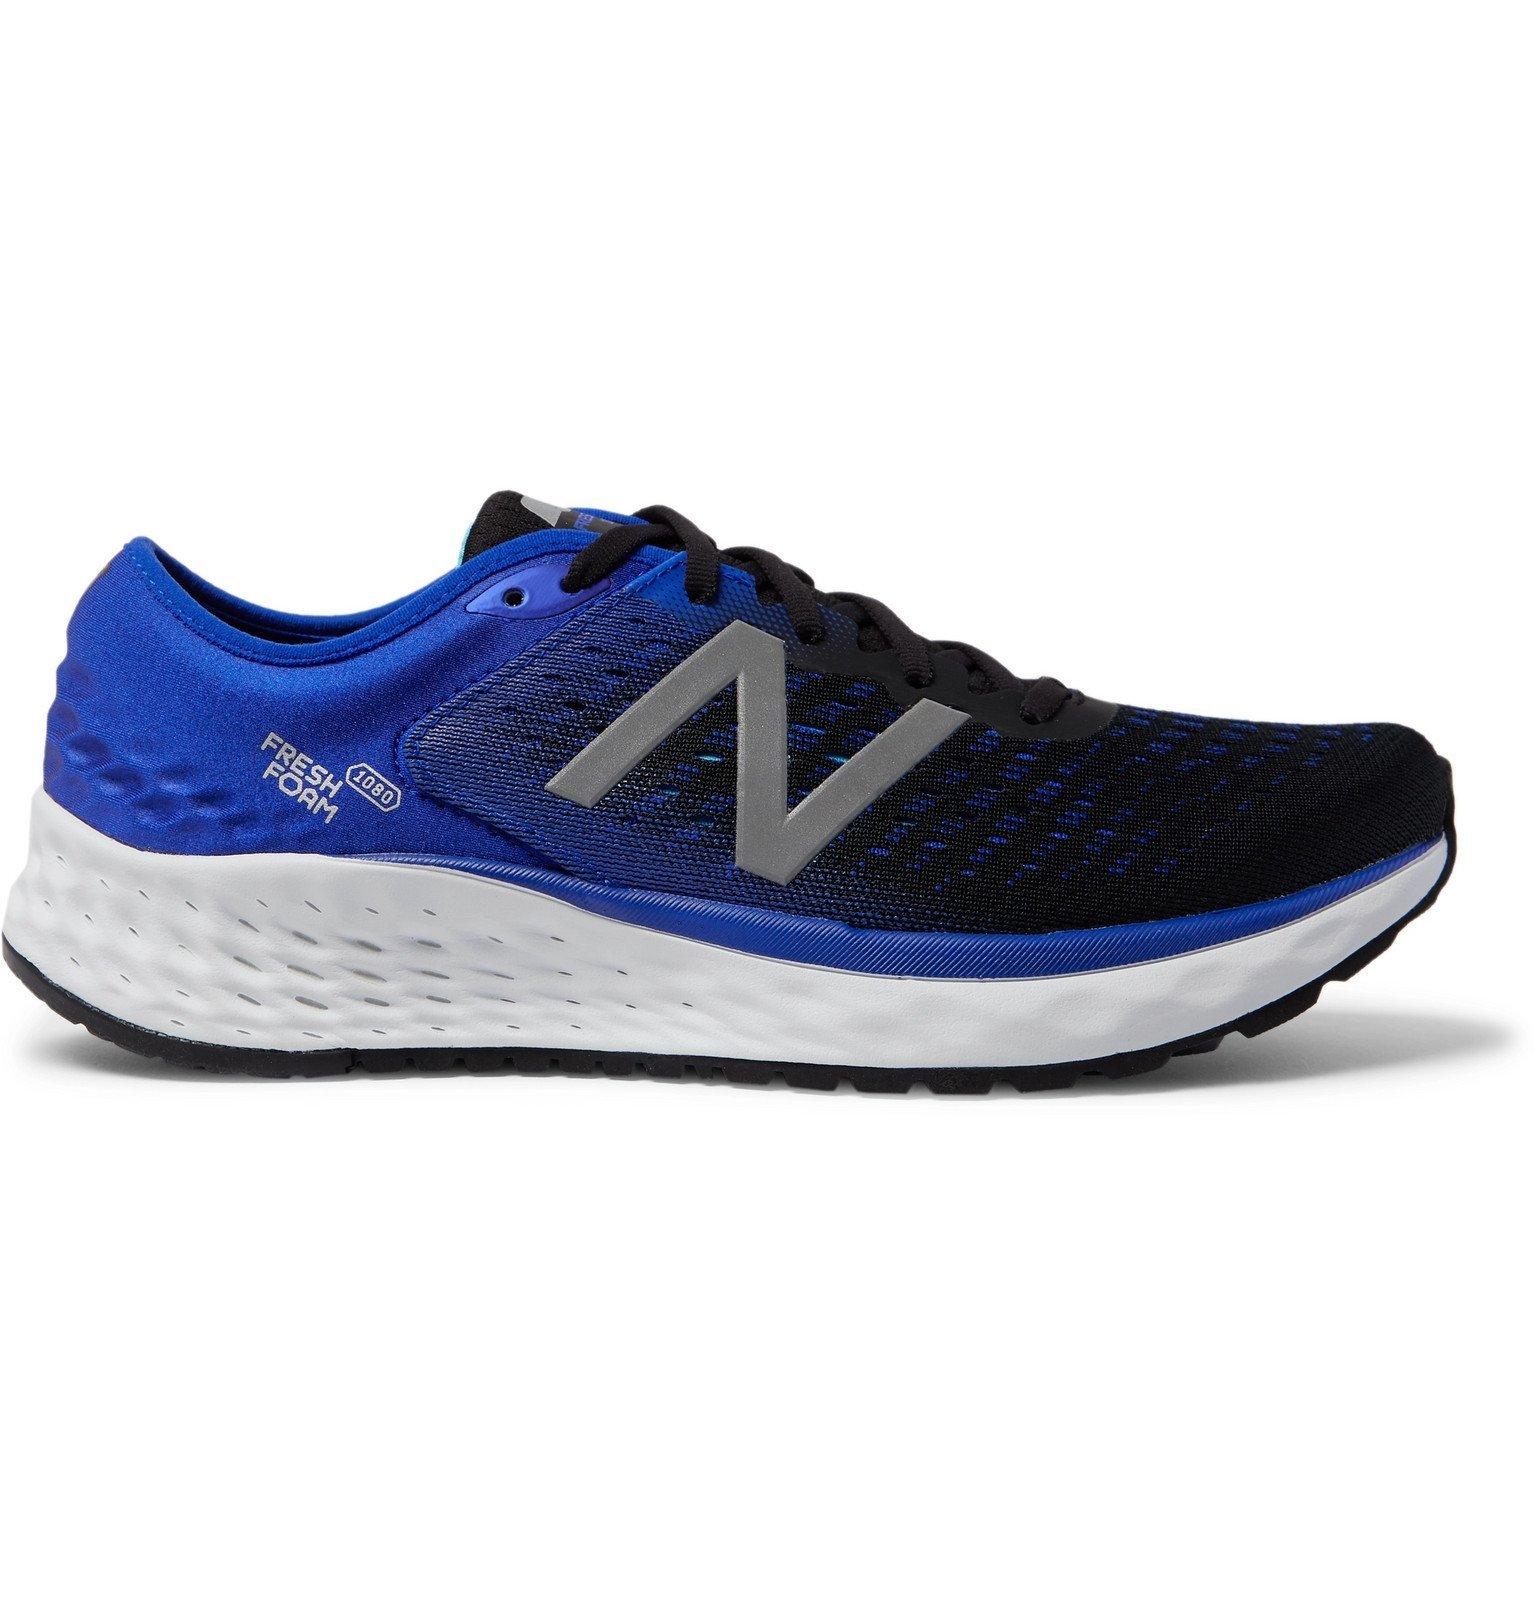 Photo: New Balance - 1080v9 Mesh and Neoprene Running Sneakers - Black